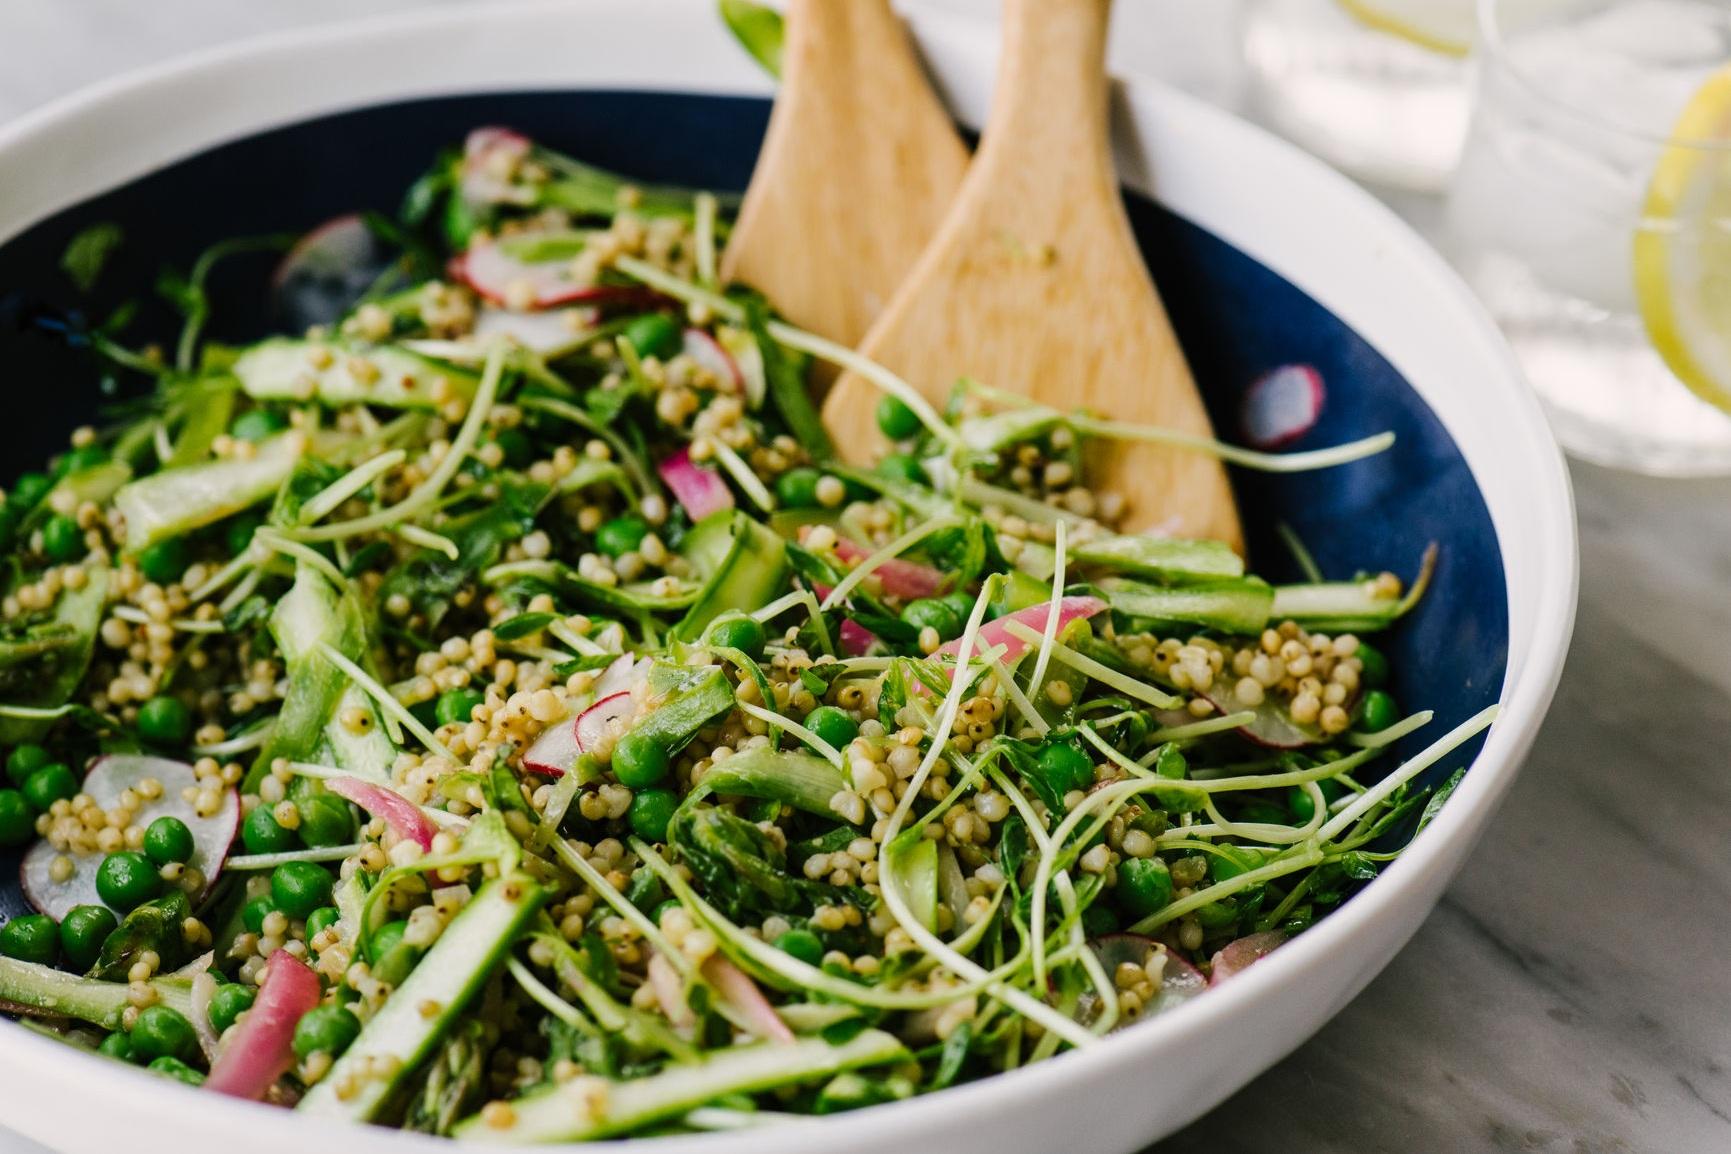 Pea+and+Sorghum+Salad.jpg